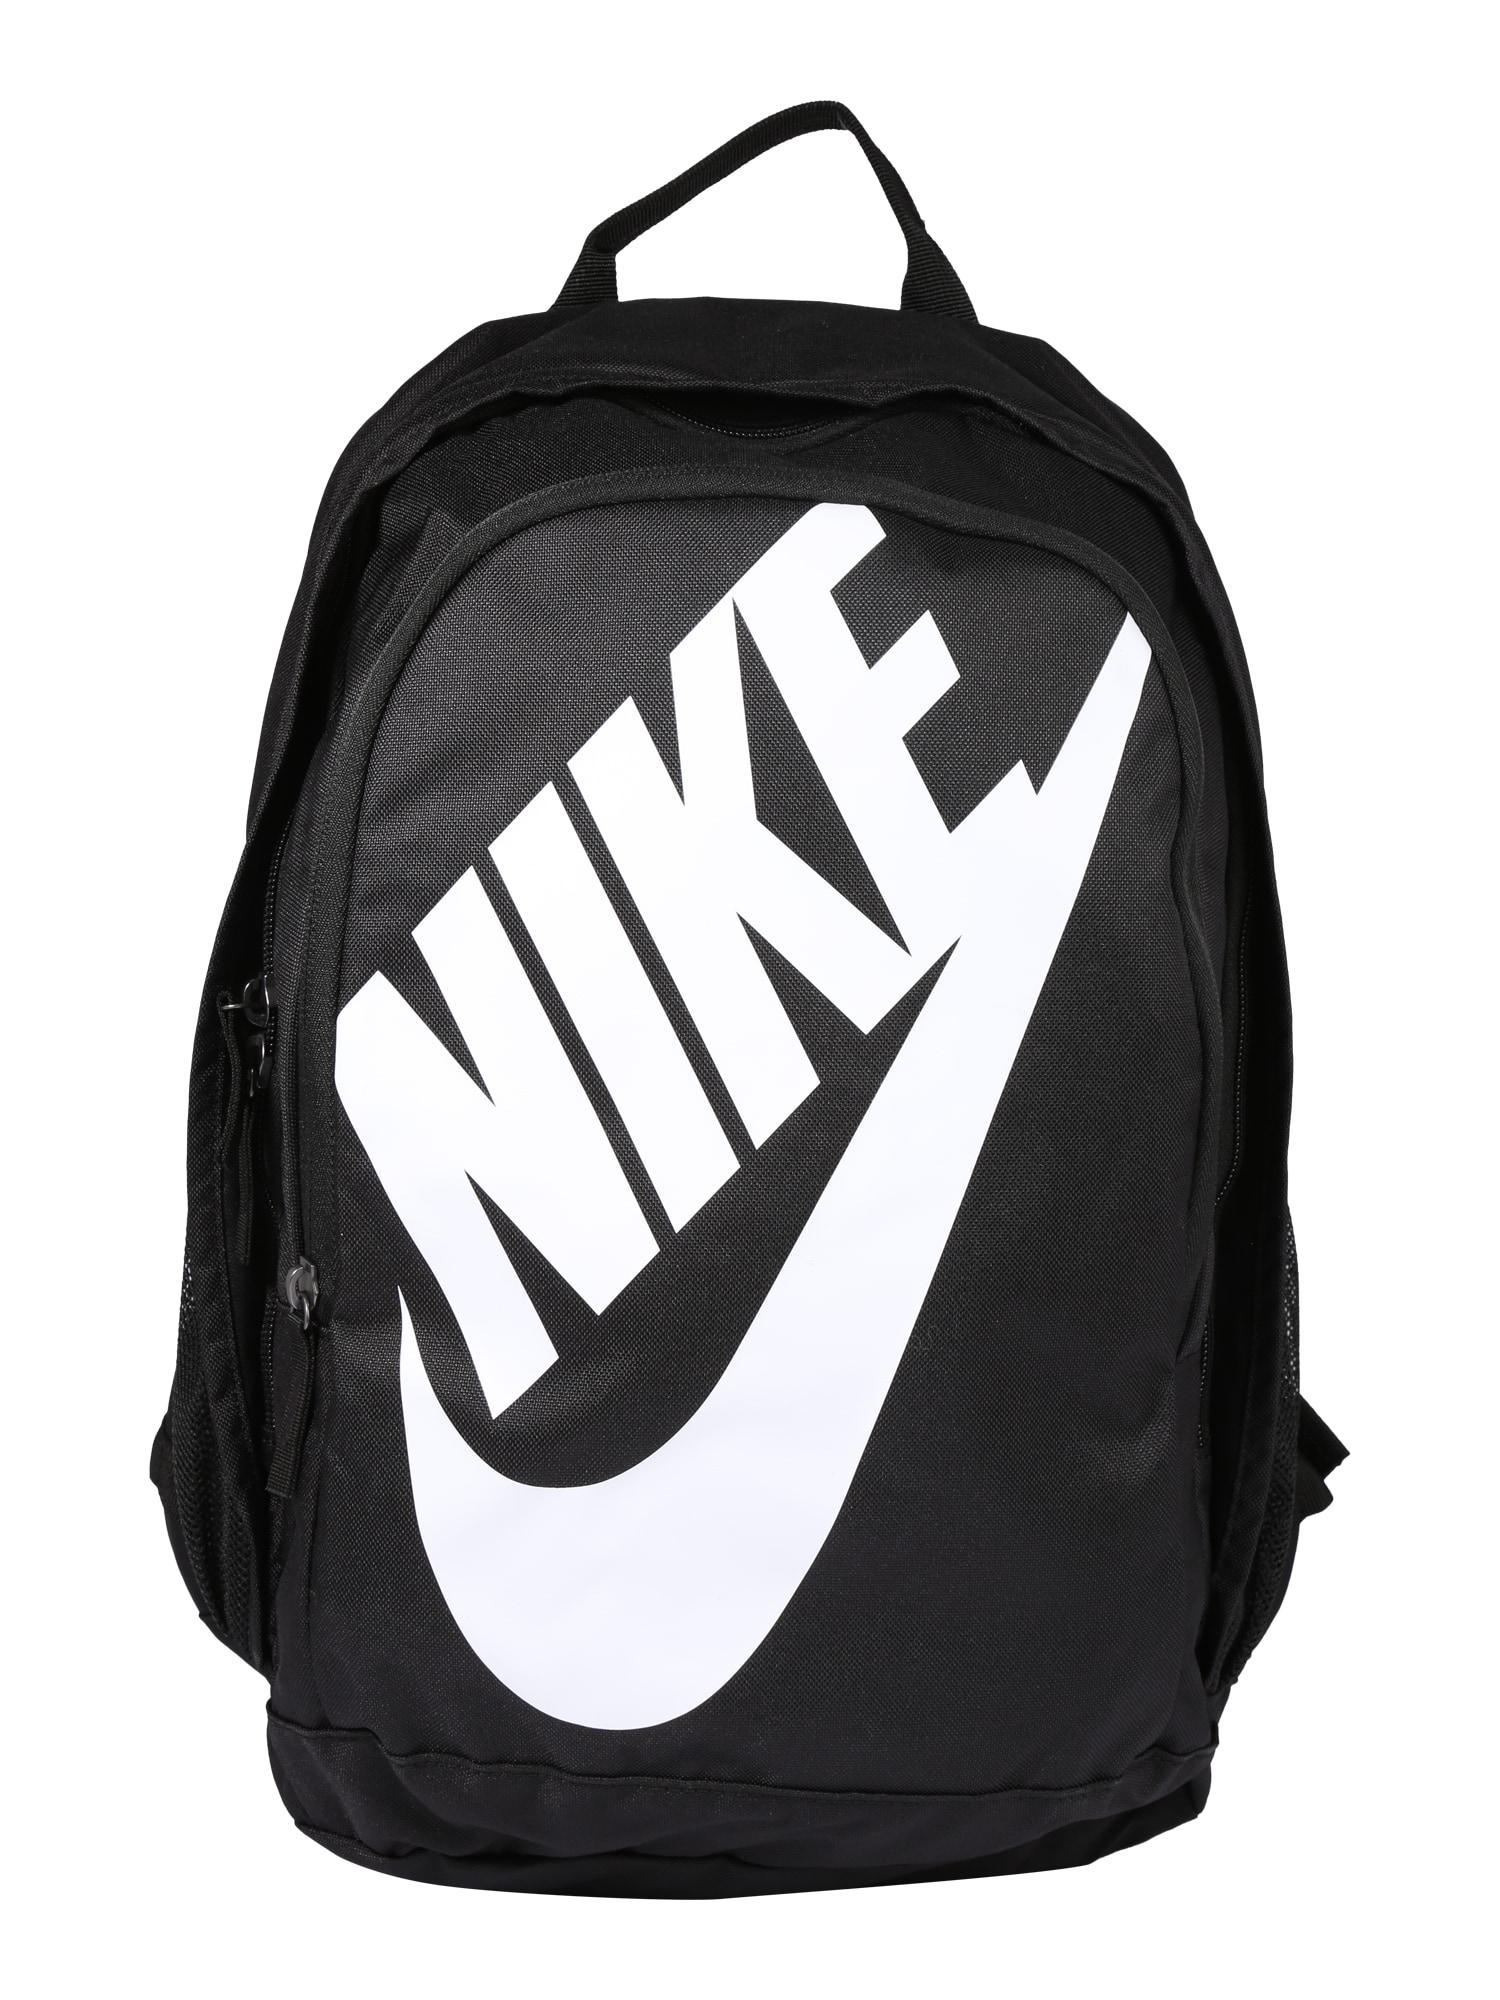 Batoh Hayward Futura černá bílá Nike Sportswear